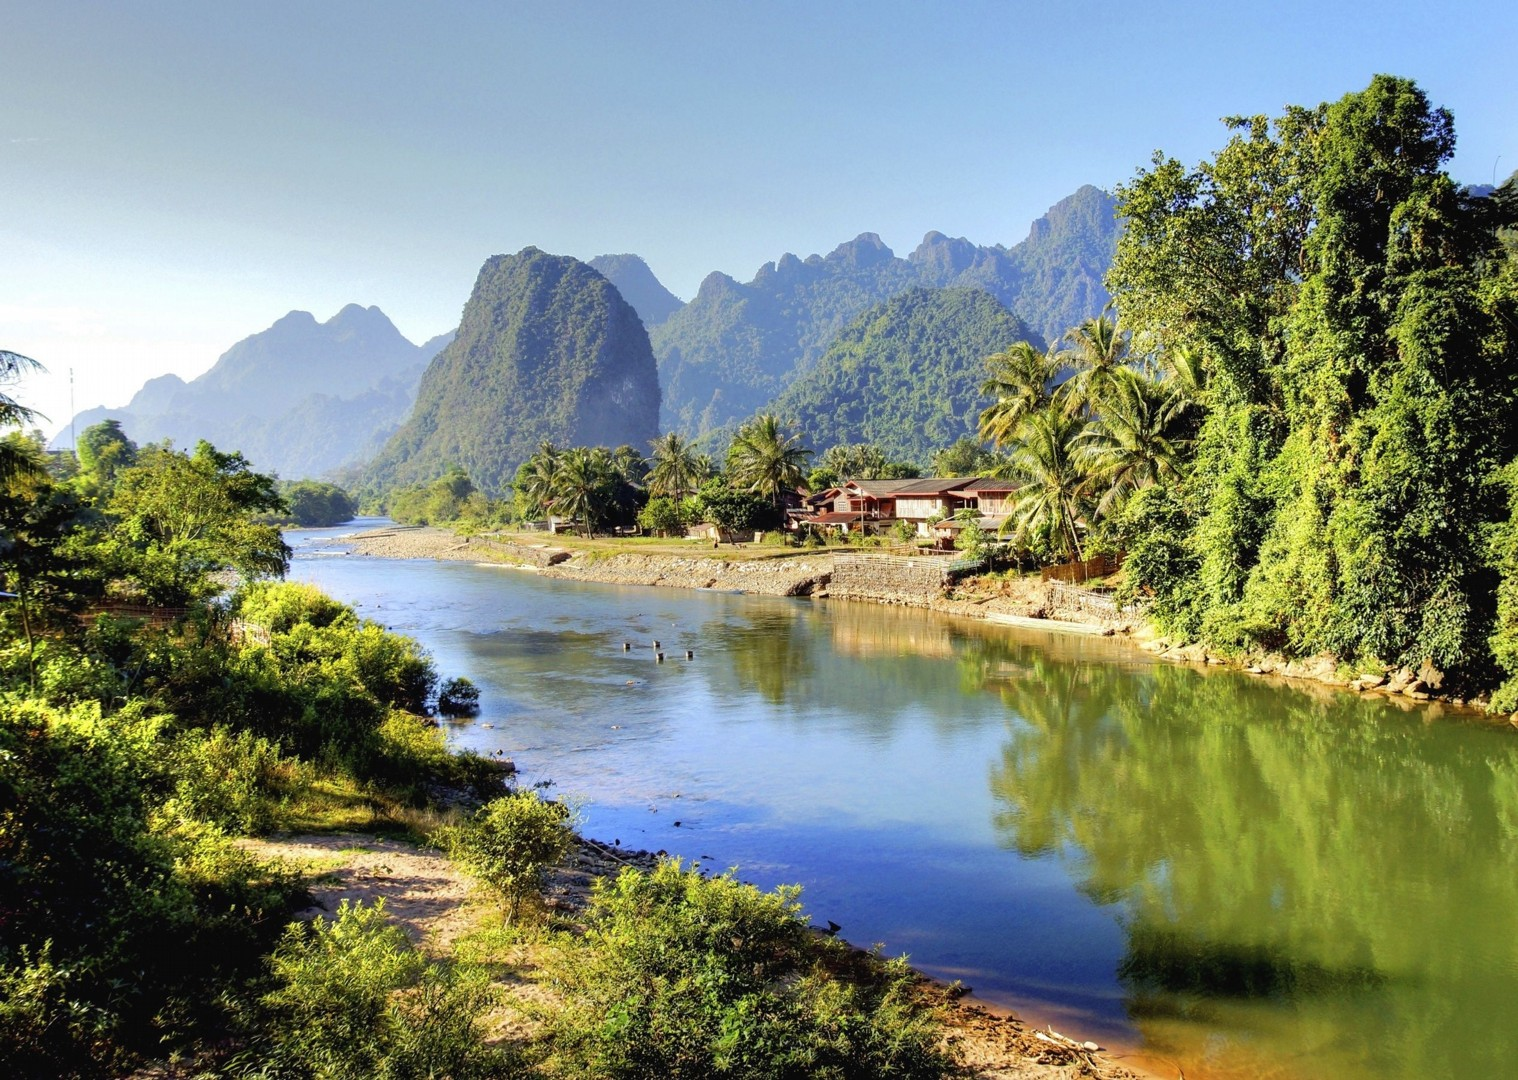 cycling-adventure-holiday-laos-landscape.jpg - Laos - Hidden Treasures - Cycling Adventures